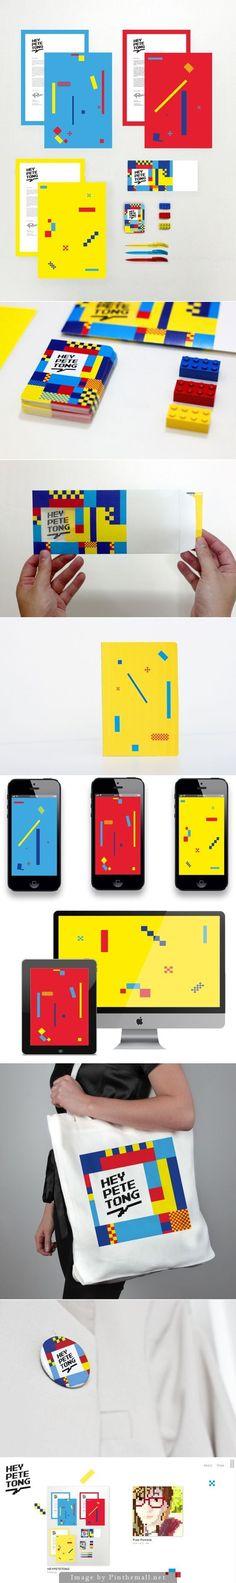 Hey Pete Tong Branding | Fivestar Branding – Design and Branding Agency & Inspiration Gallery